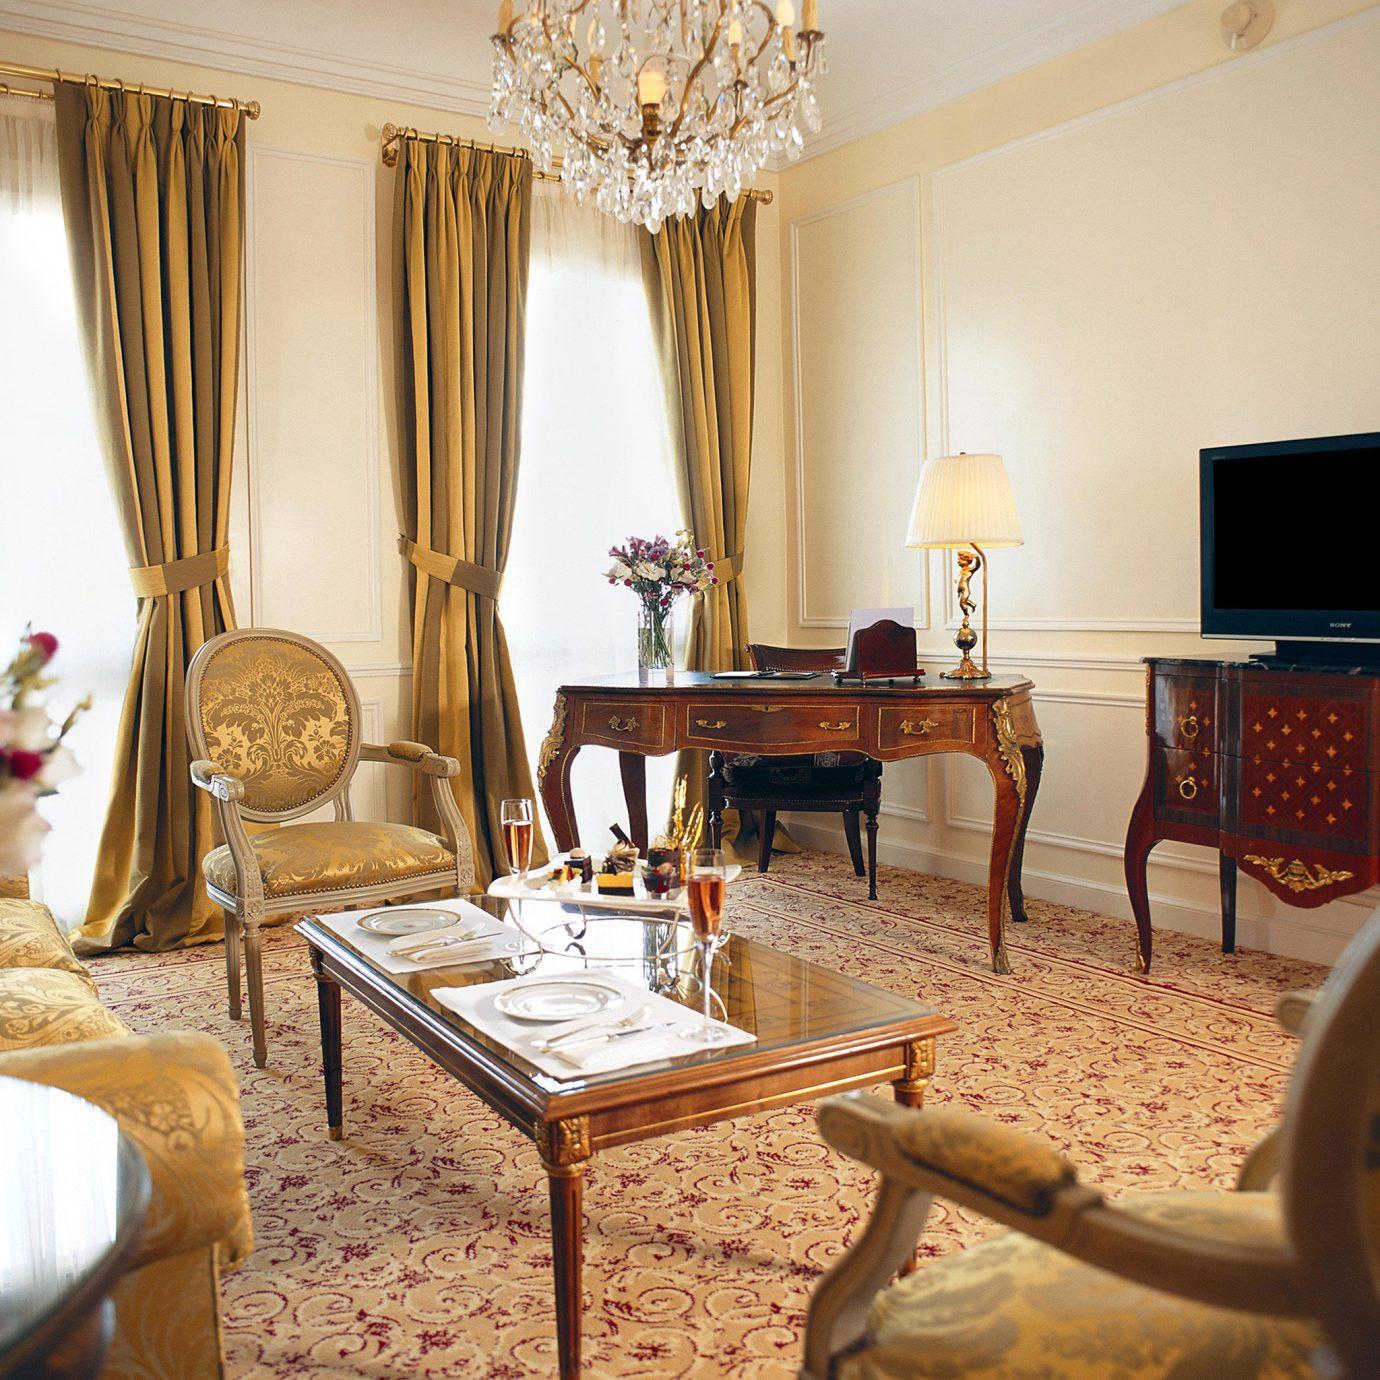 Bedroom Elegant Hotels Luxury property chair living room home Suite Villa cottage mansion dining table